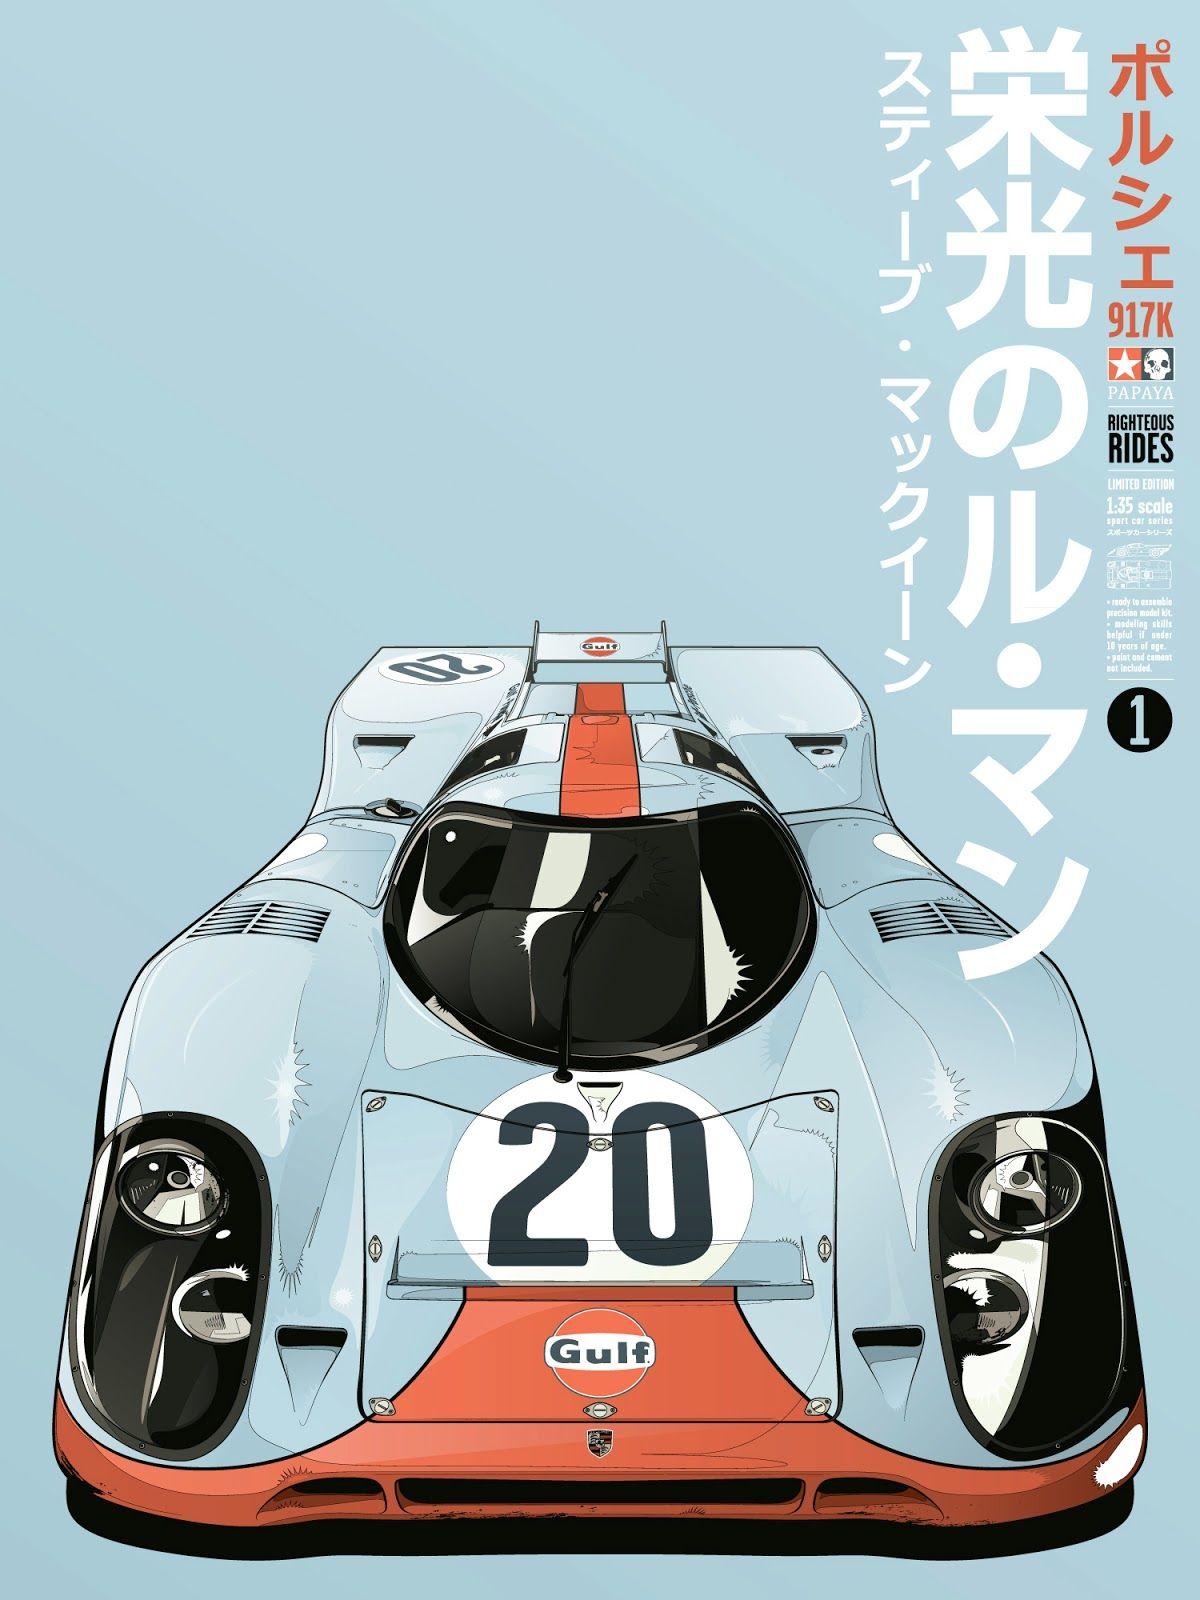 Home gt steve mcqueen porsche paintings - Kako Porsche 917k Le Mans Gulf Steve Mcqueen Porsche 917k Lemans Stevemcqueen